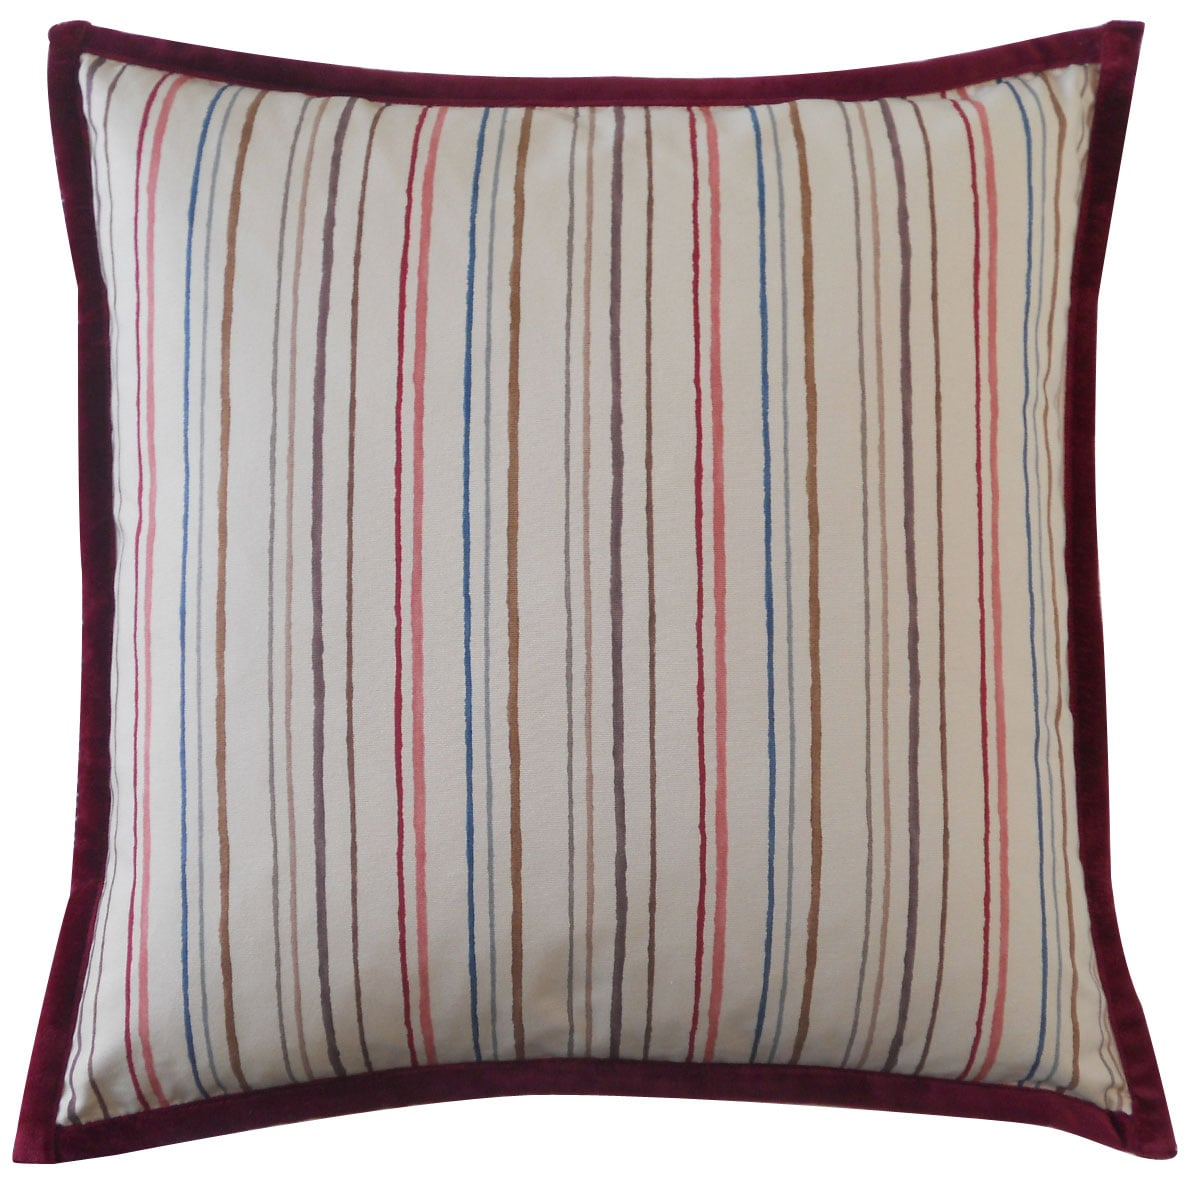 Jiti Alita Stripes Down Throw Pillow